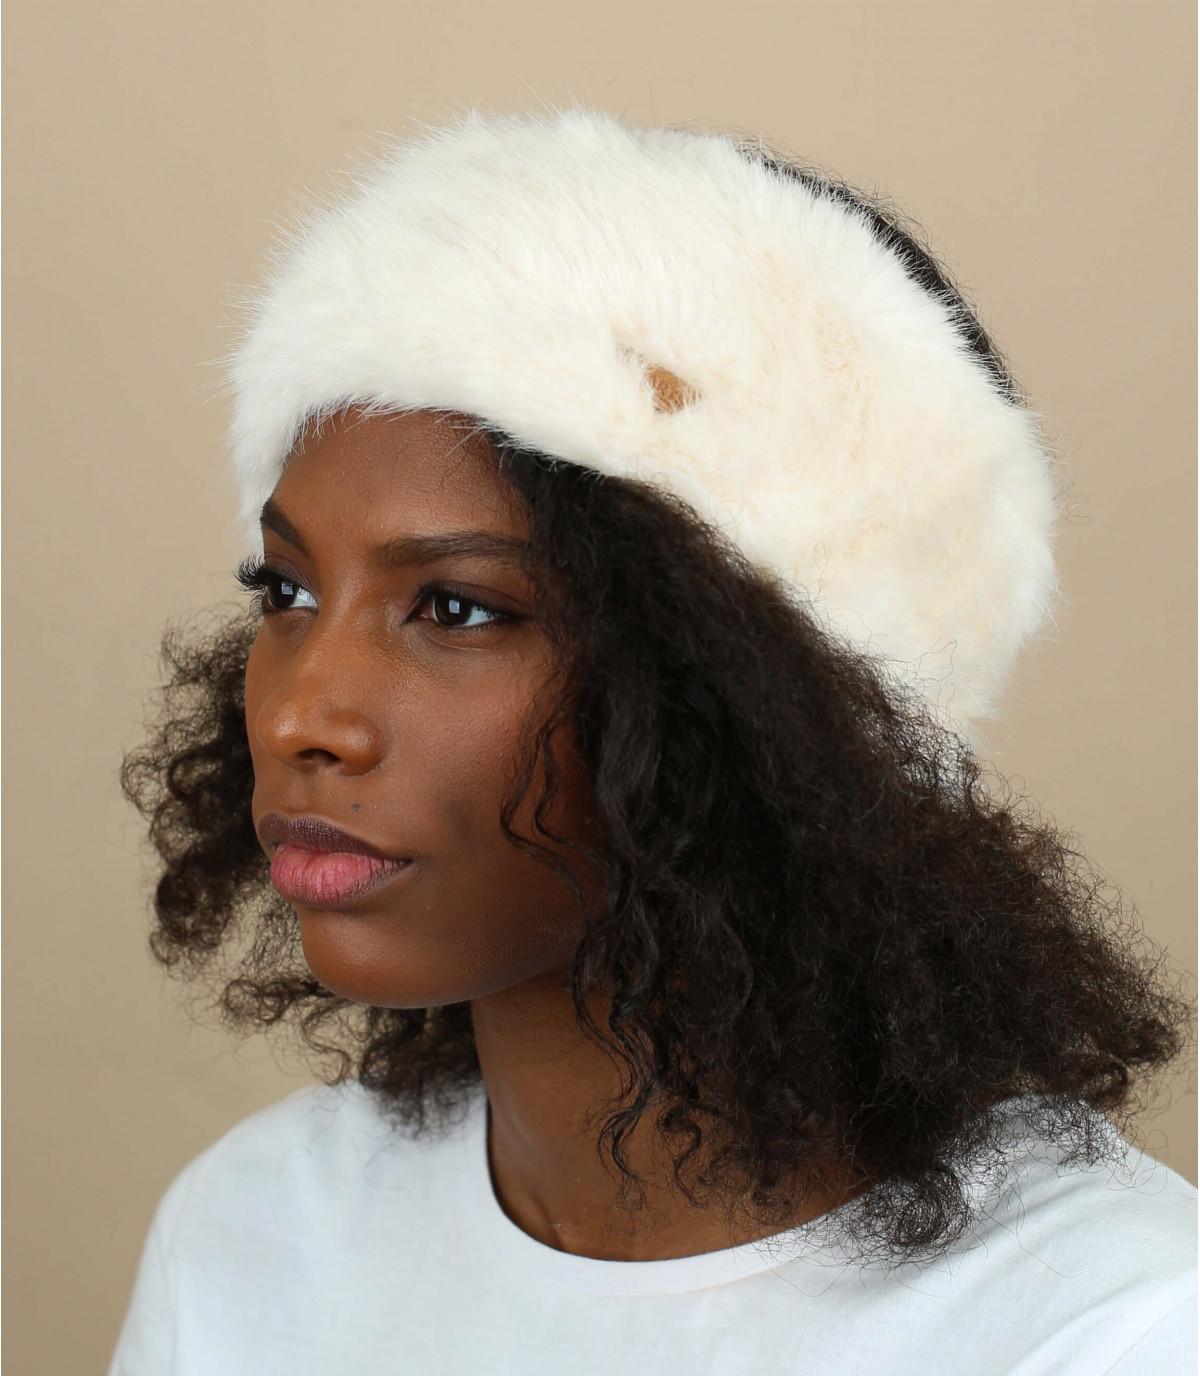 White fur headband